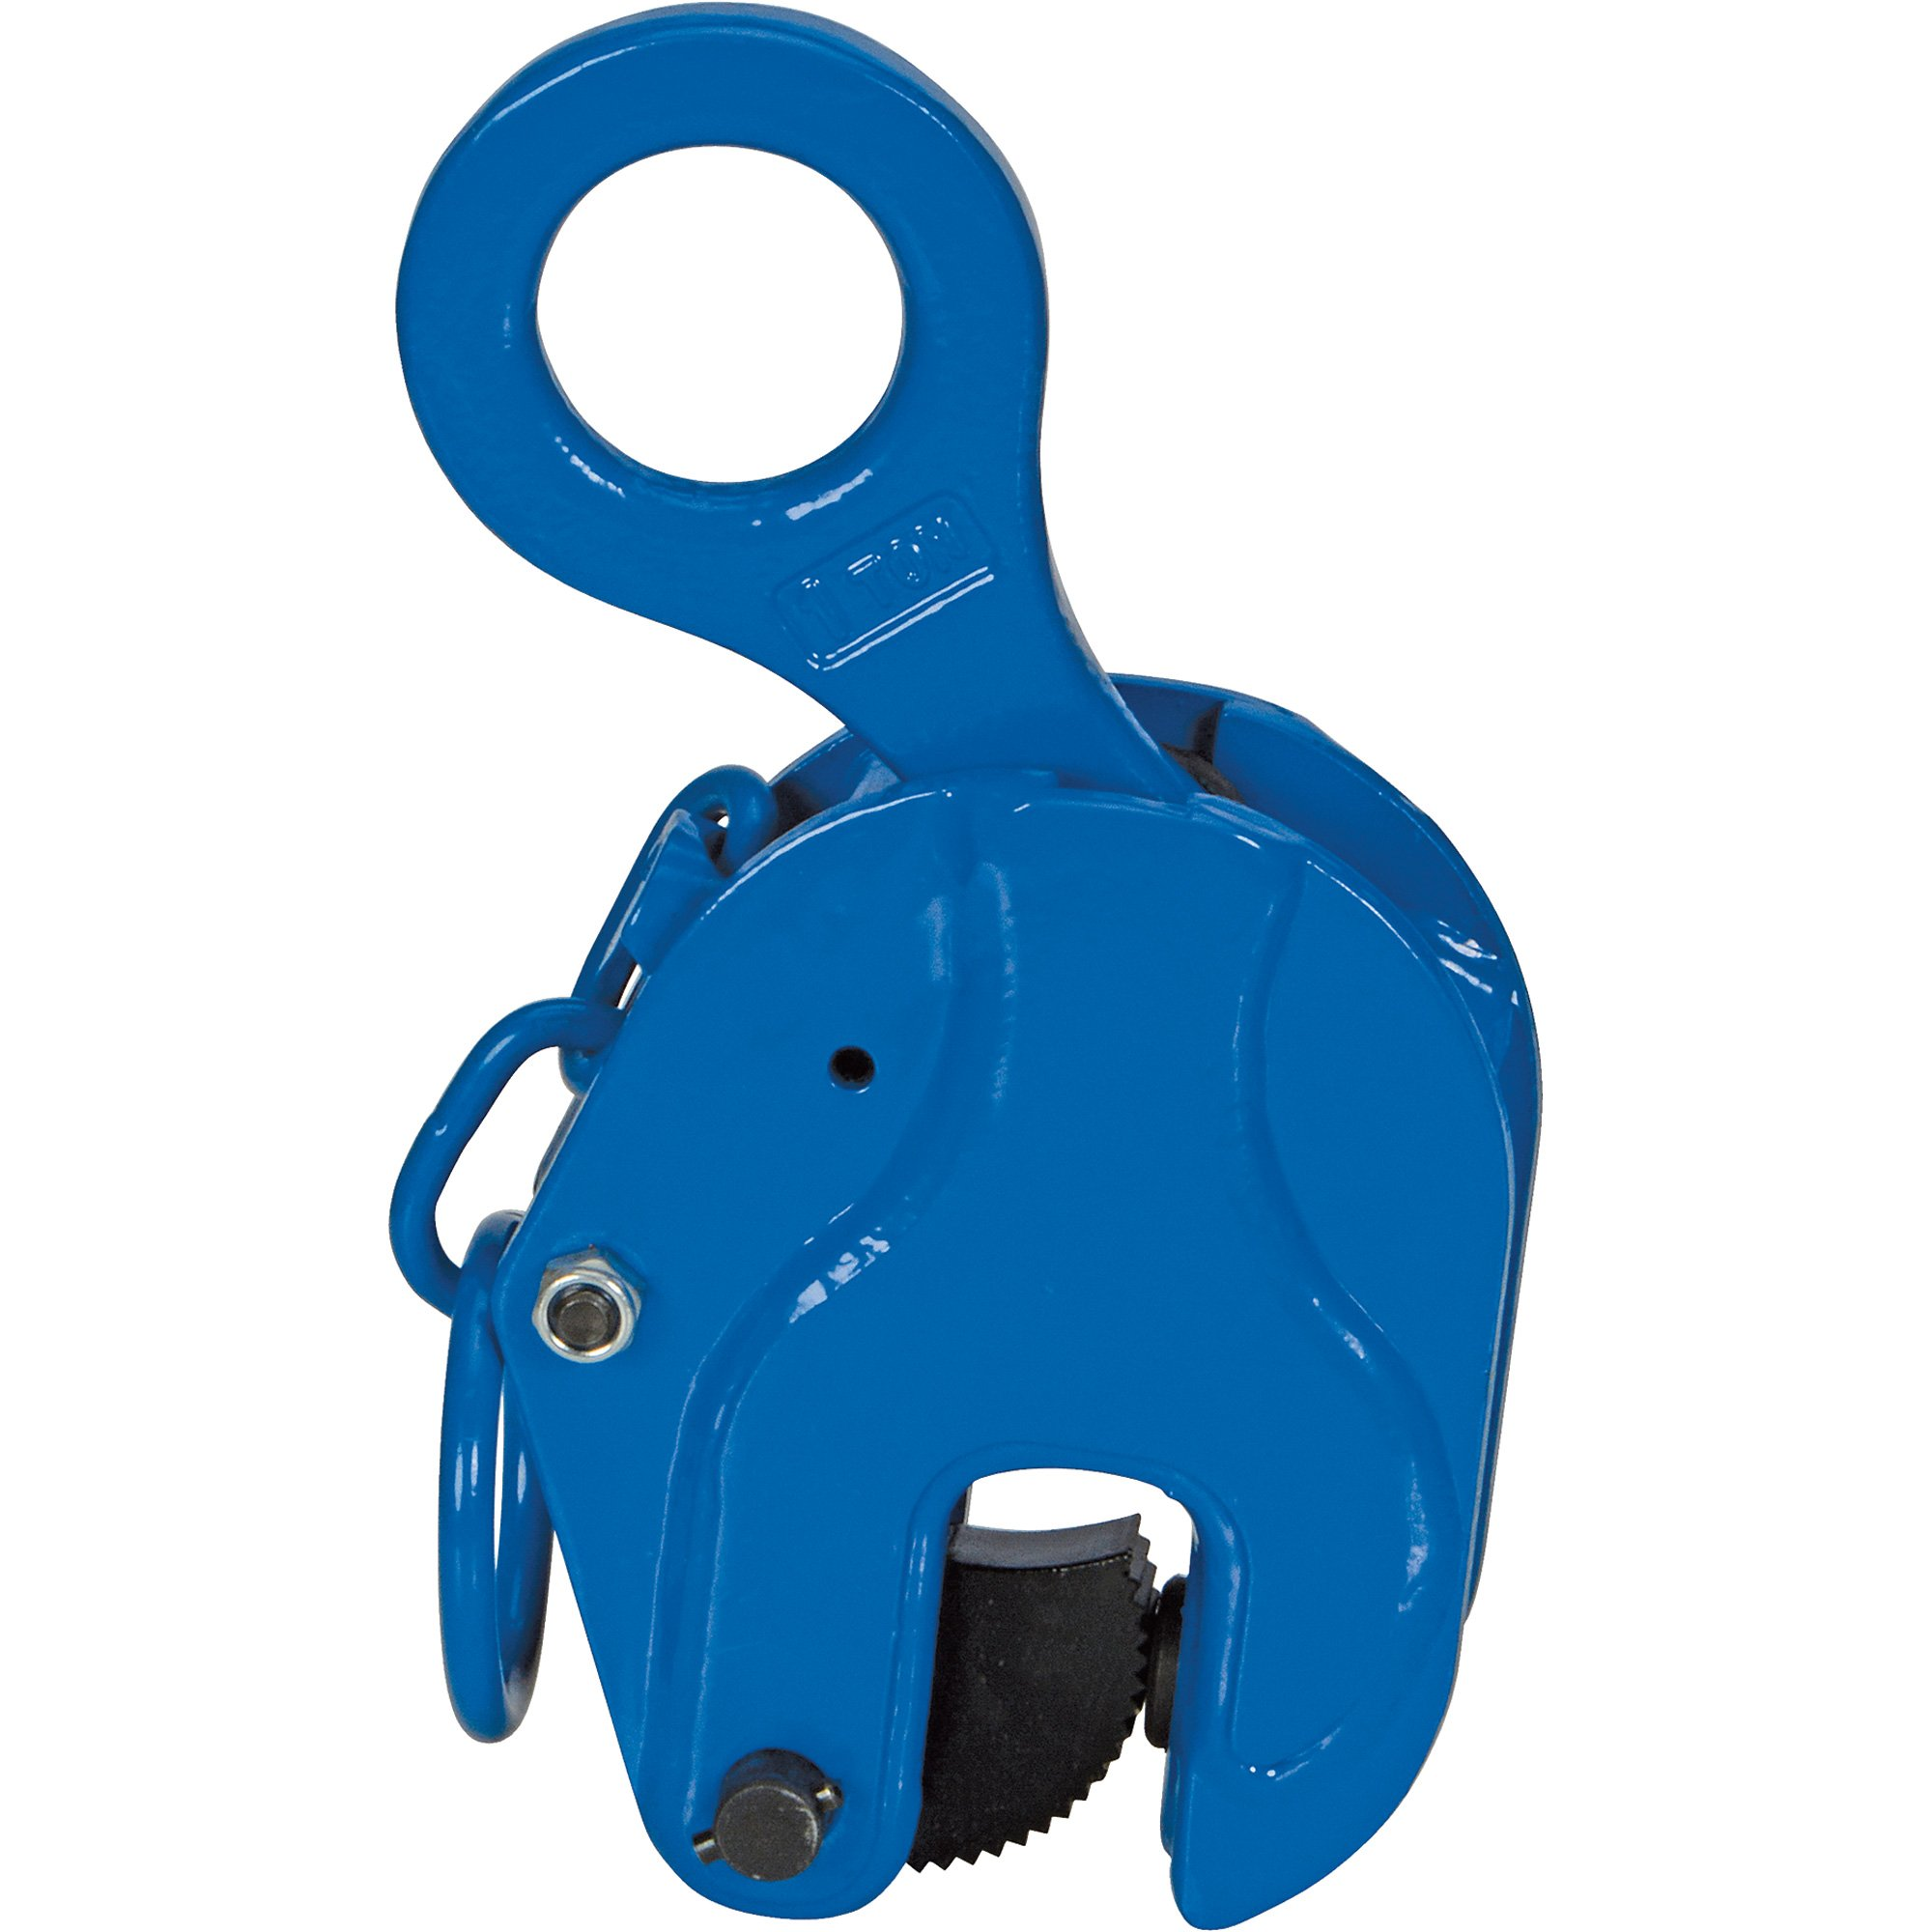 Vestil Positive Lock Plate Clamps - 2,000-Lb. Capacity, Model# LPC-20